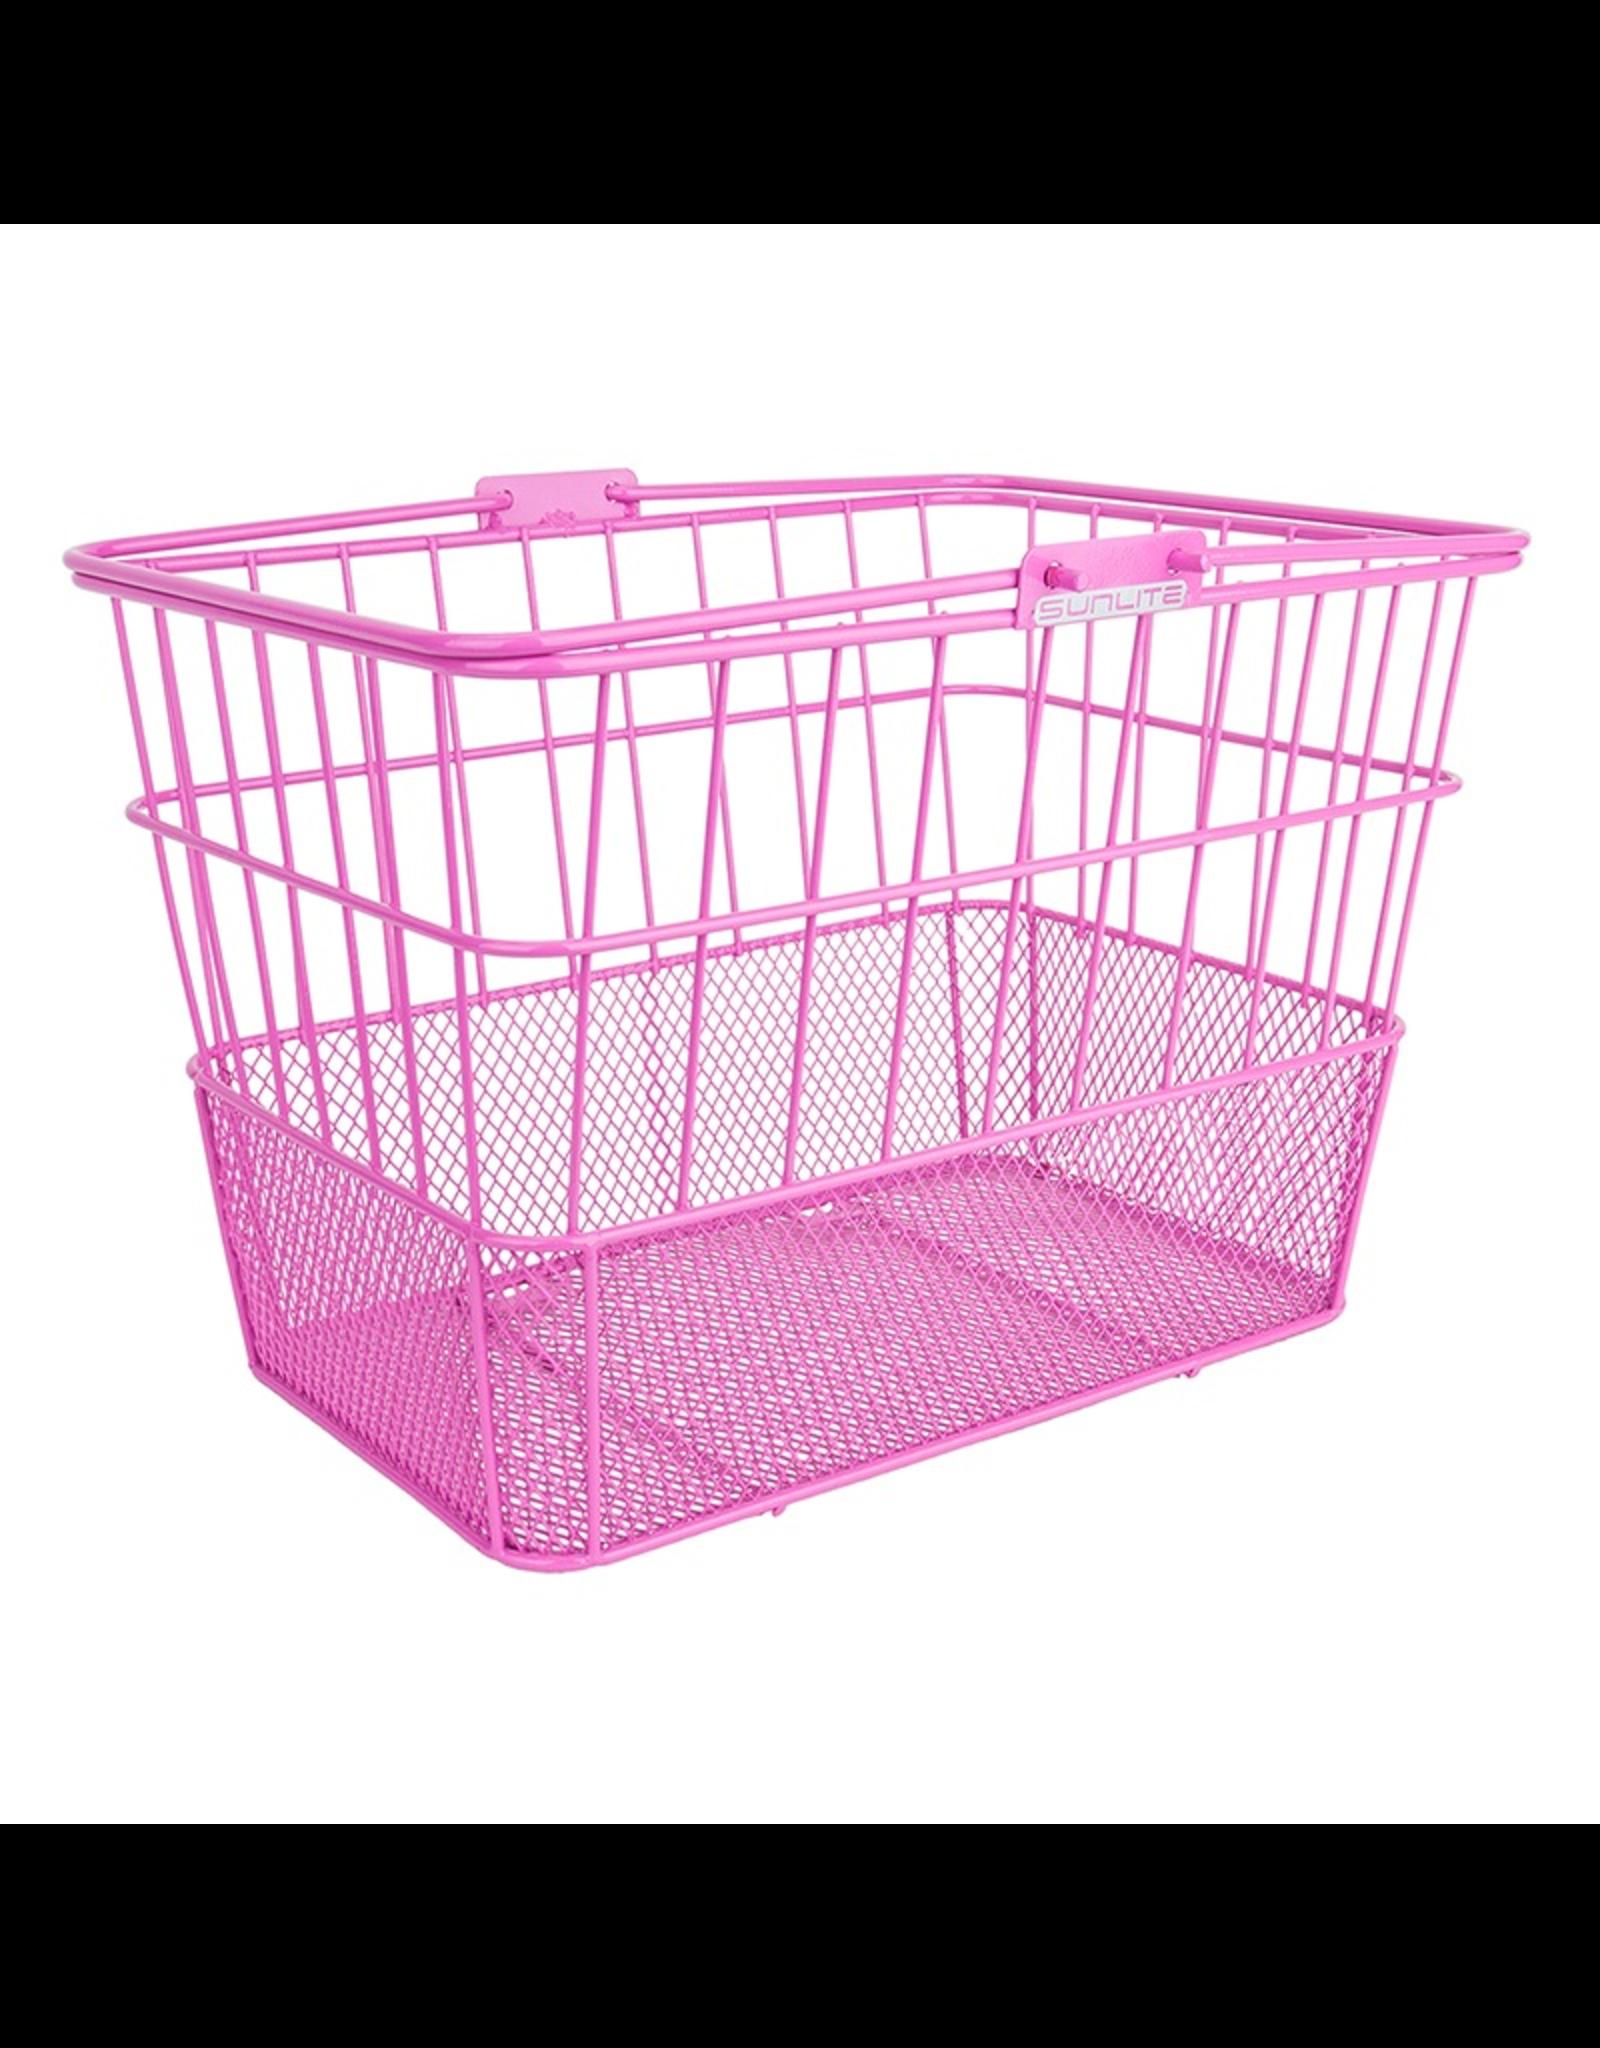 Sunlite SunLite/Ultracycle Front Basket - Mesh Bottom Lift-Off, Pink